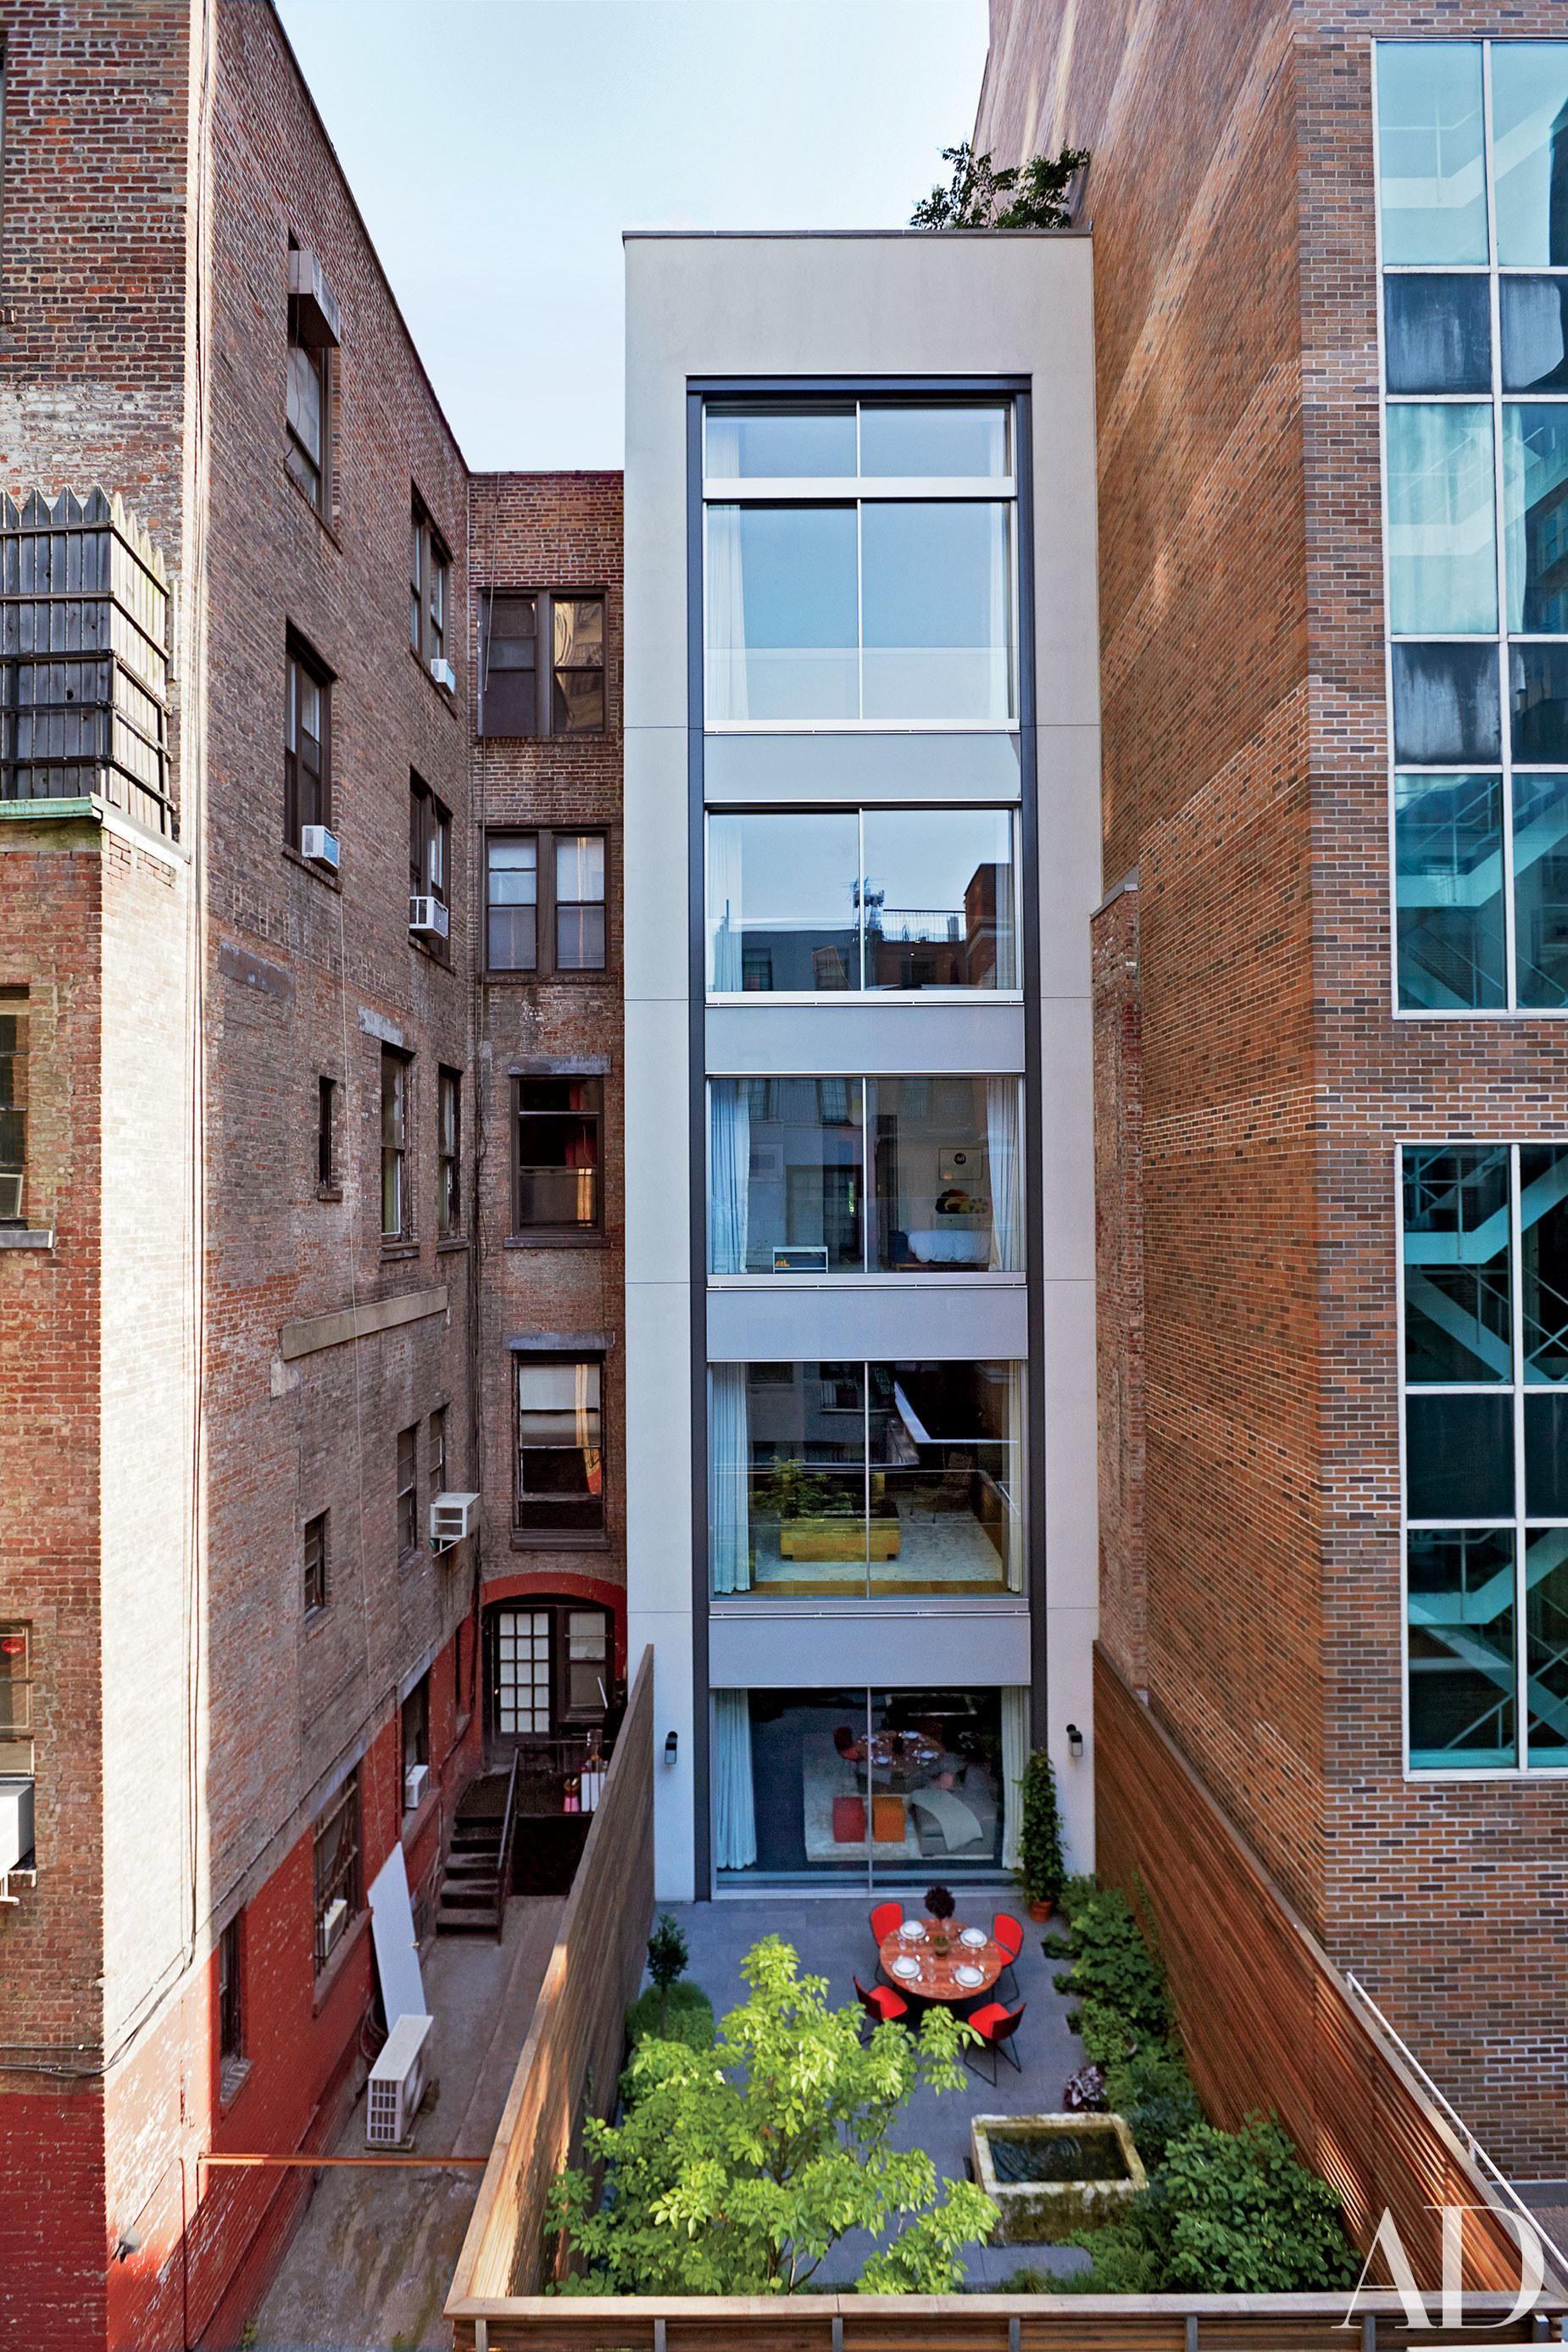 14 Sophisticated Designs by Selldorf Architects | Architektur und ...